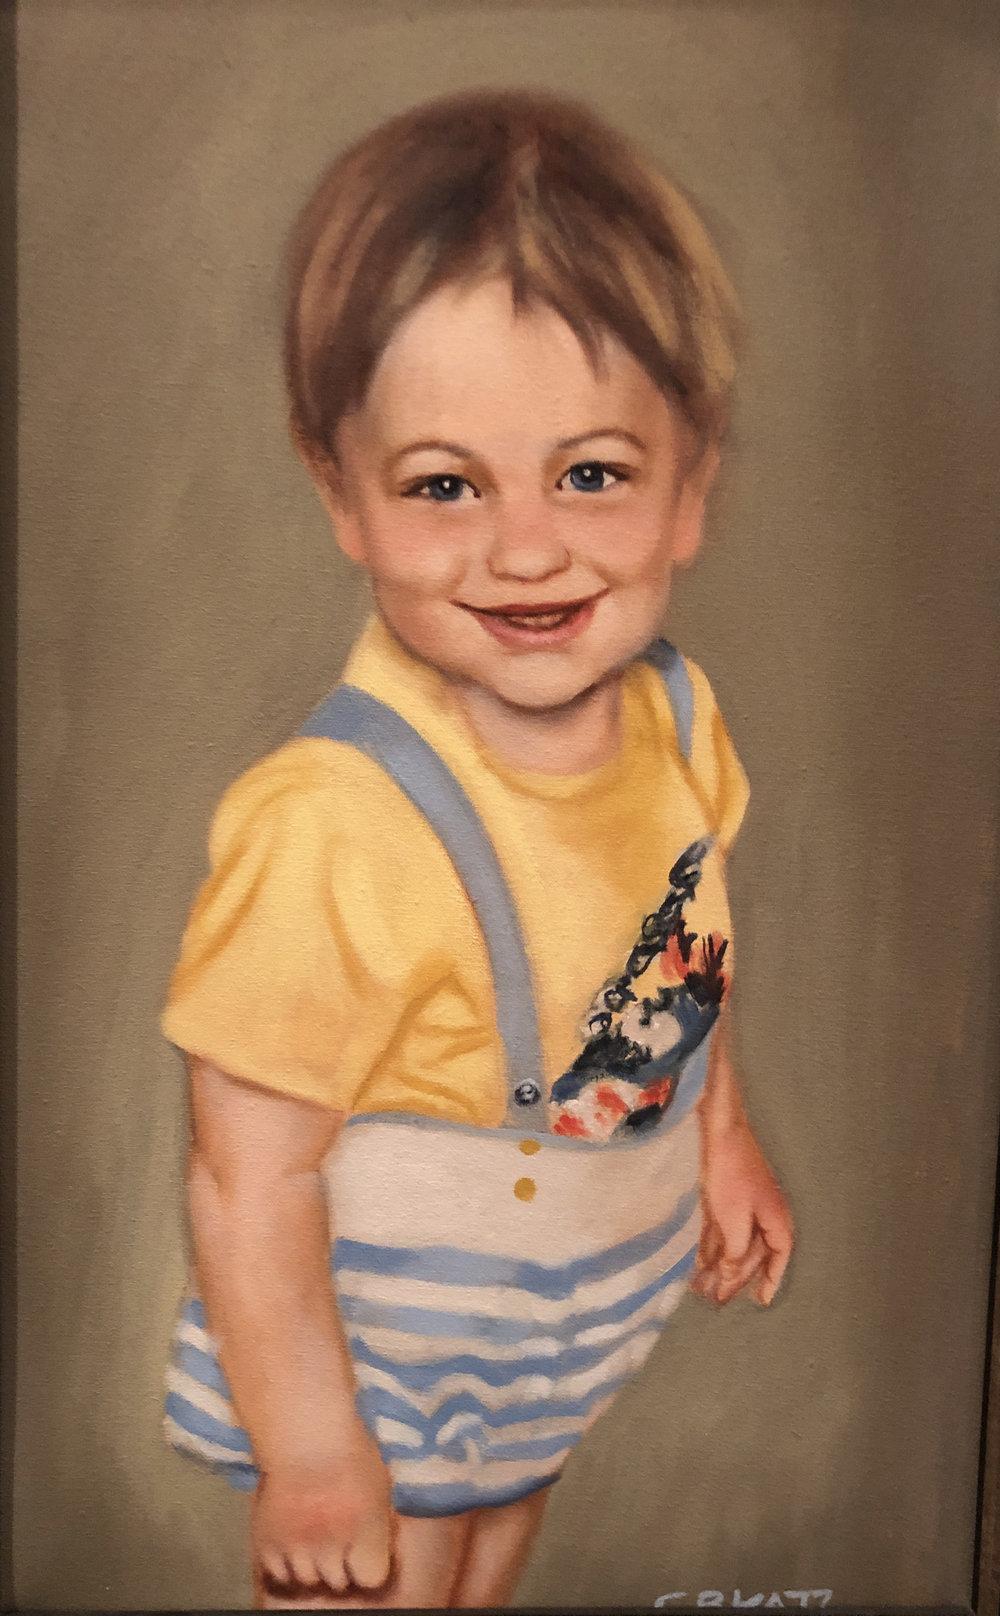 Little Jonathan